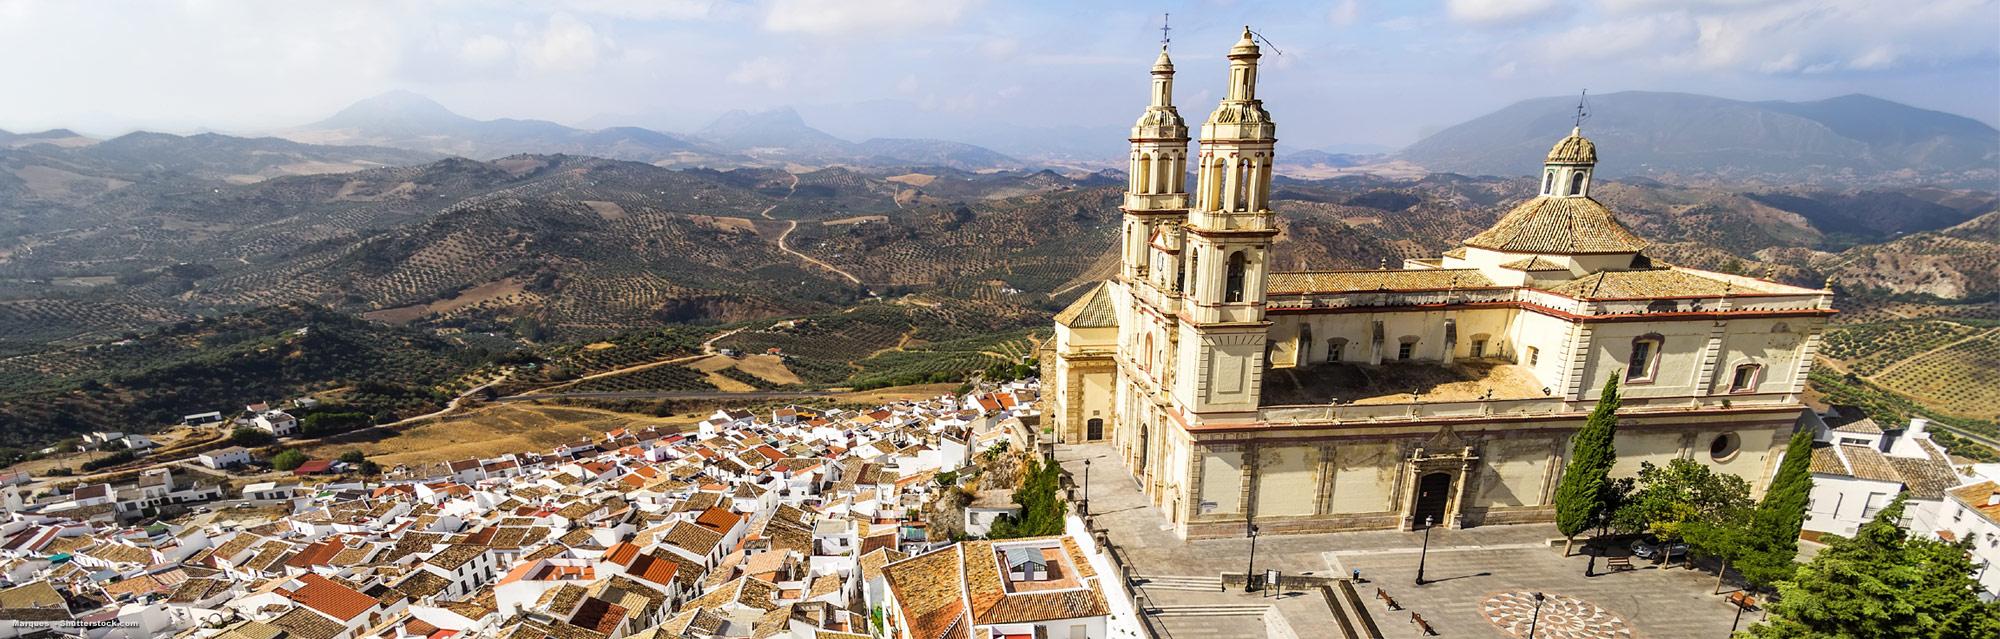 Sprachreisen nach Cádiz